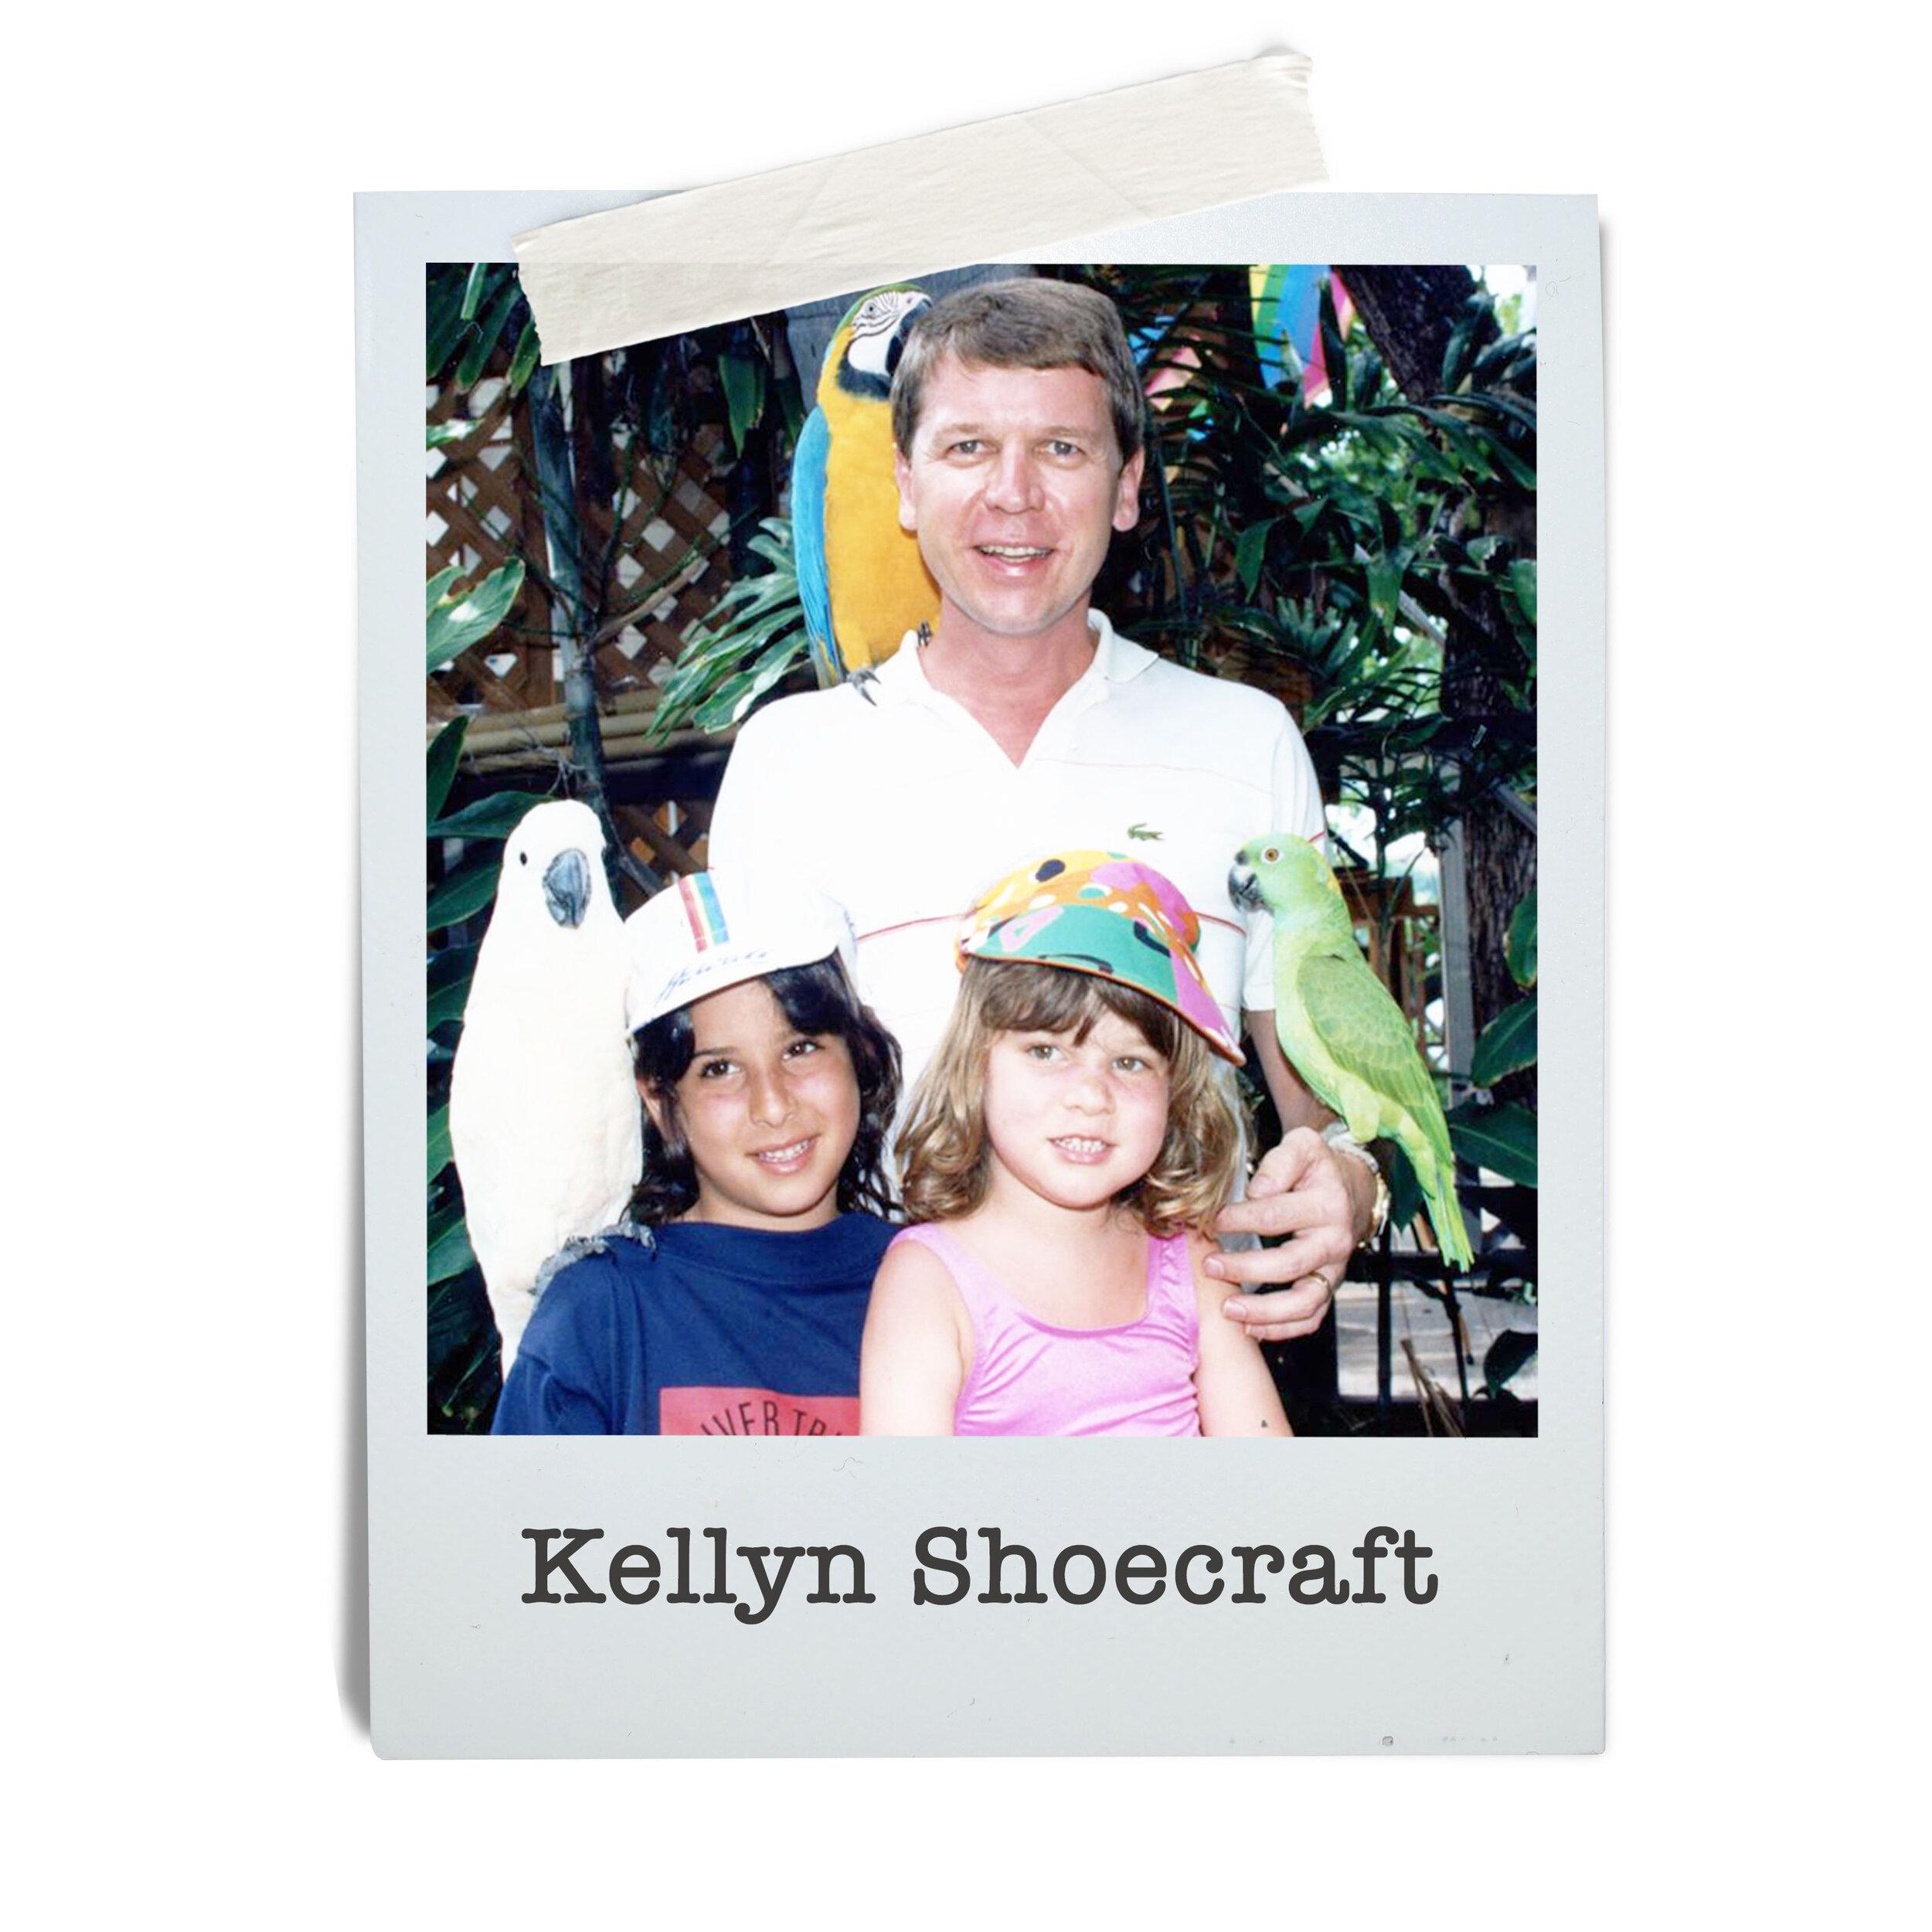 Kellyn Shoecraft